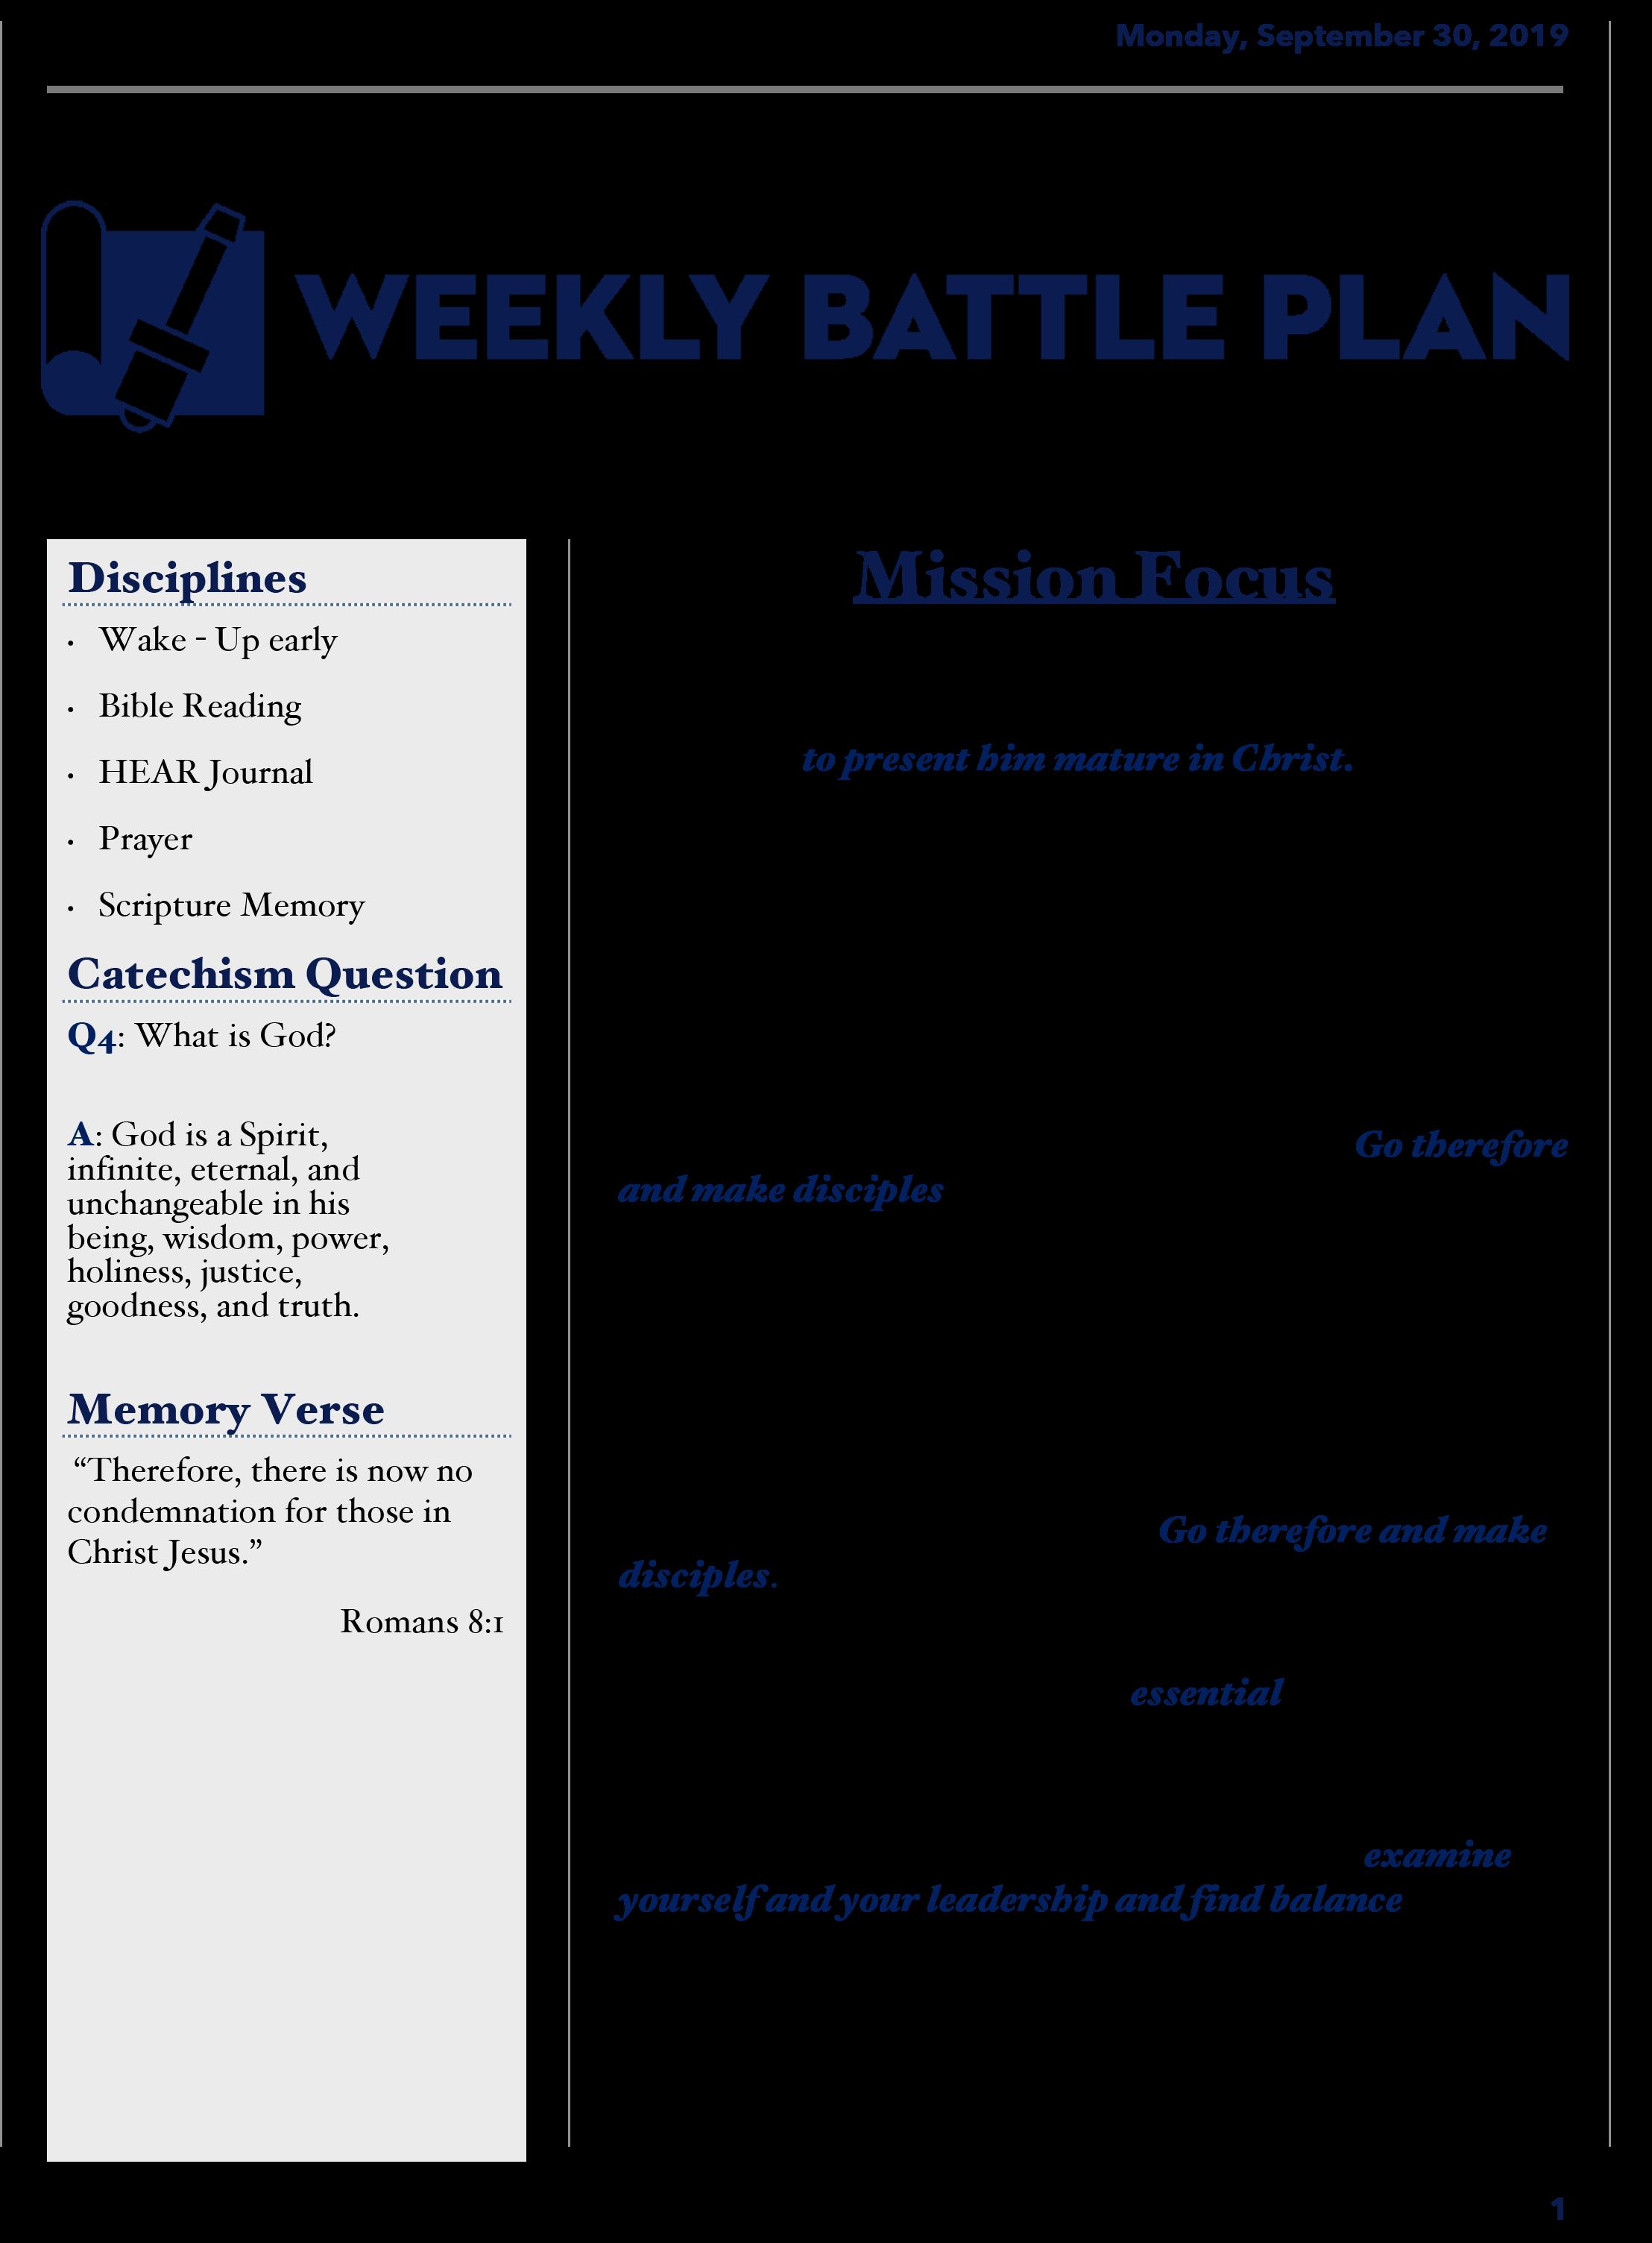 Battle plan (9.30.19)-1.png